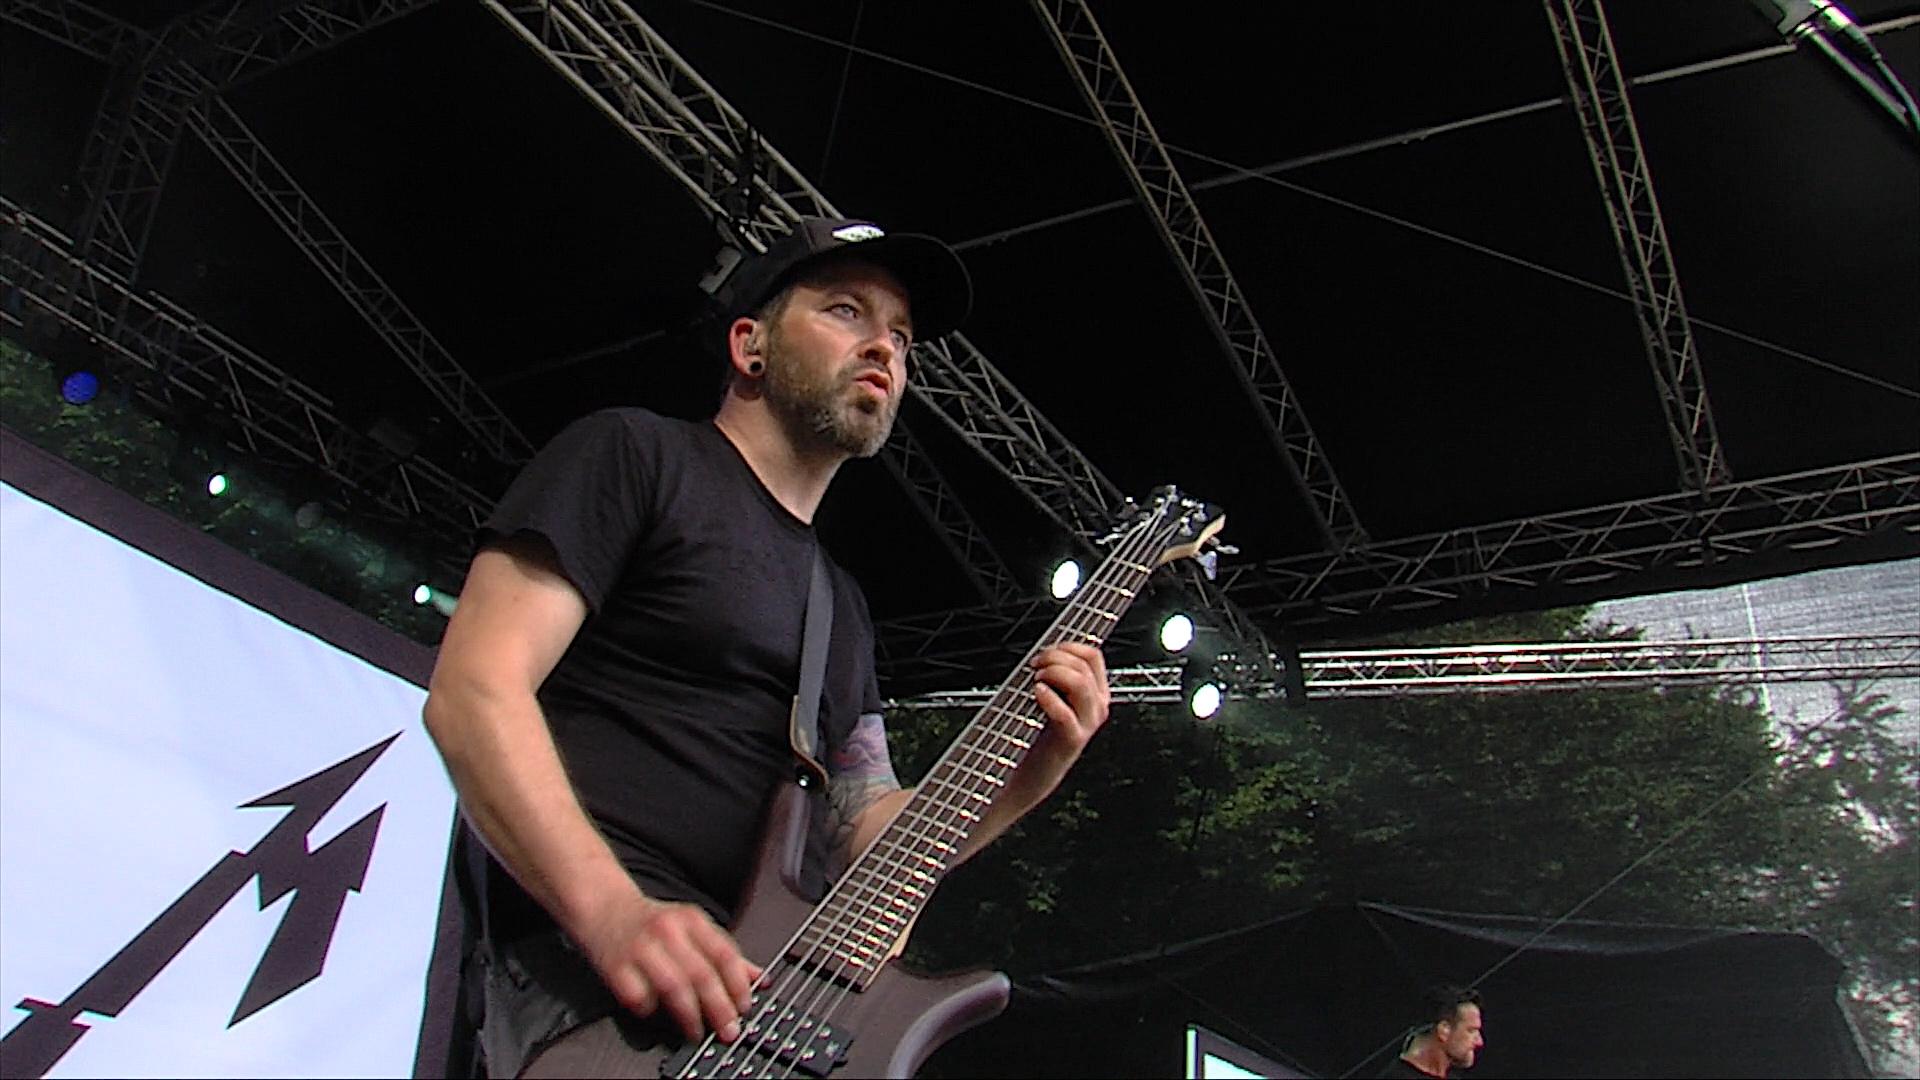 mytallica-dortmund-rock-n-tribute-festival-2017-warwick-bass-live